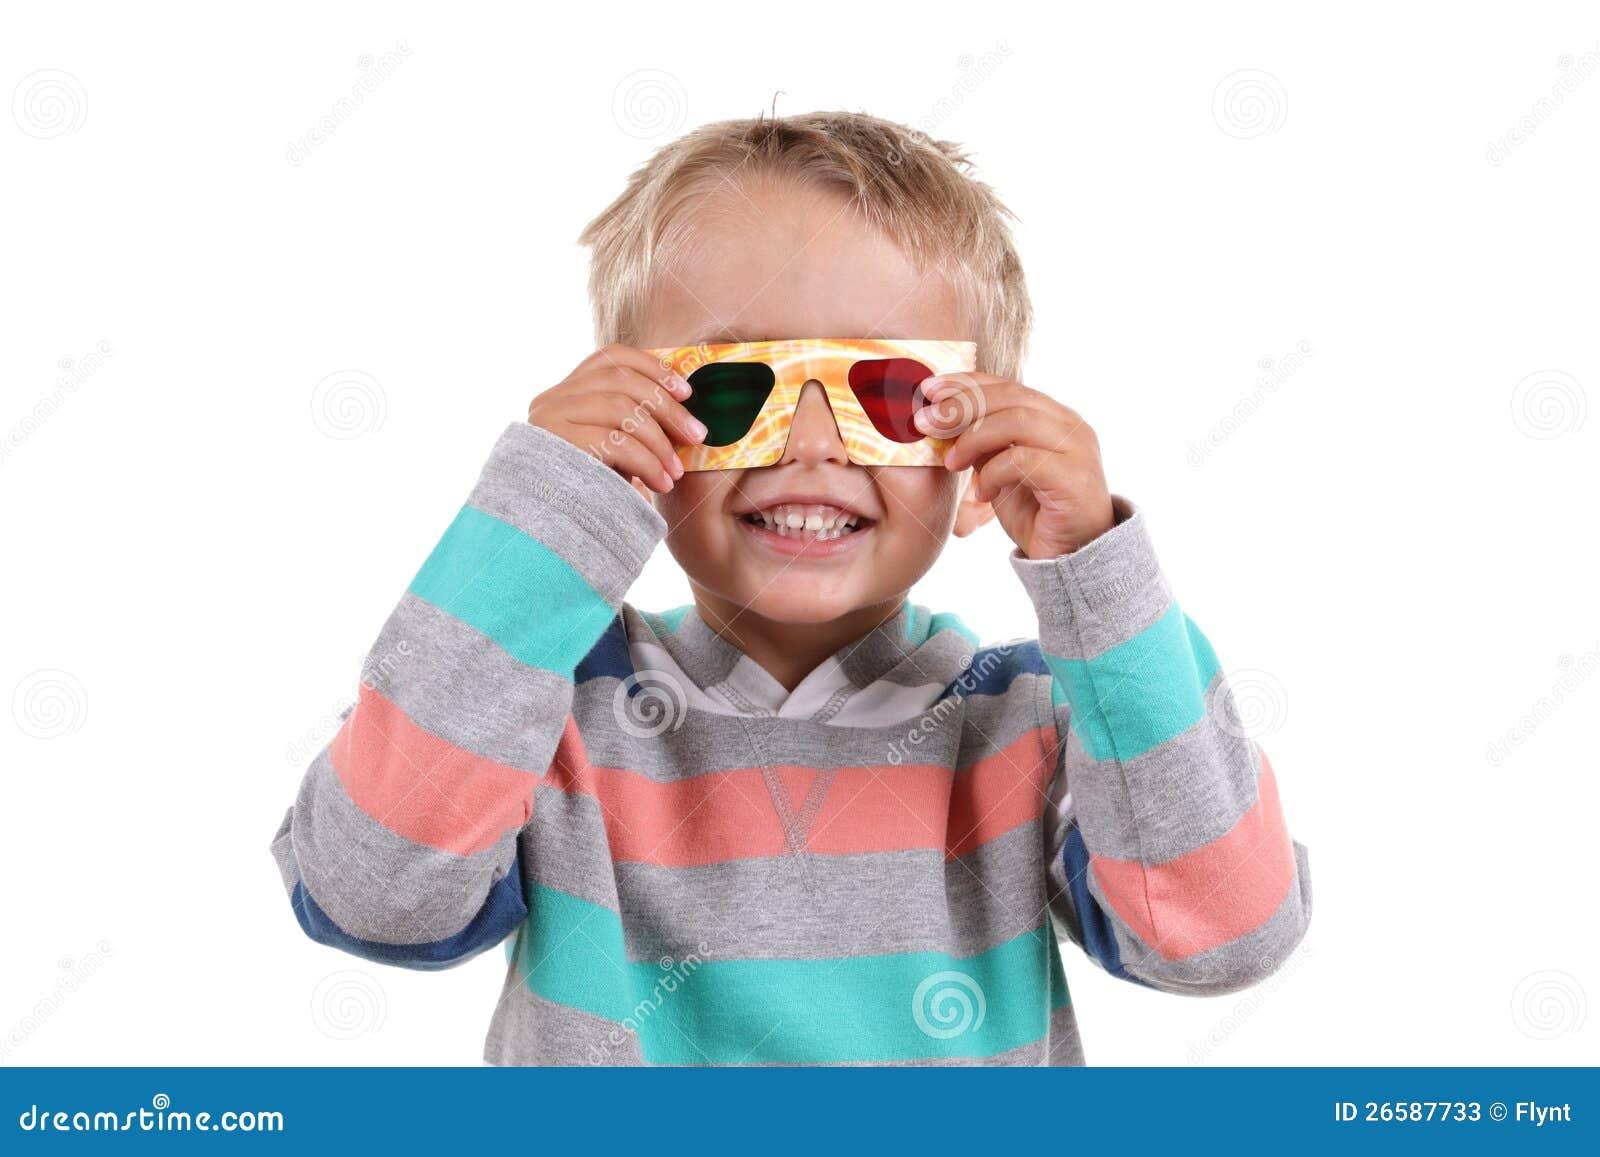 3D Glasses Stock Photos - Image: 26587733